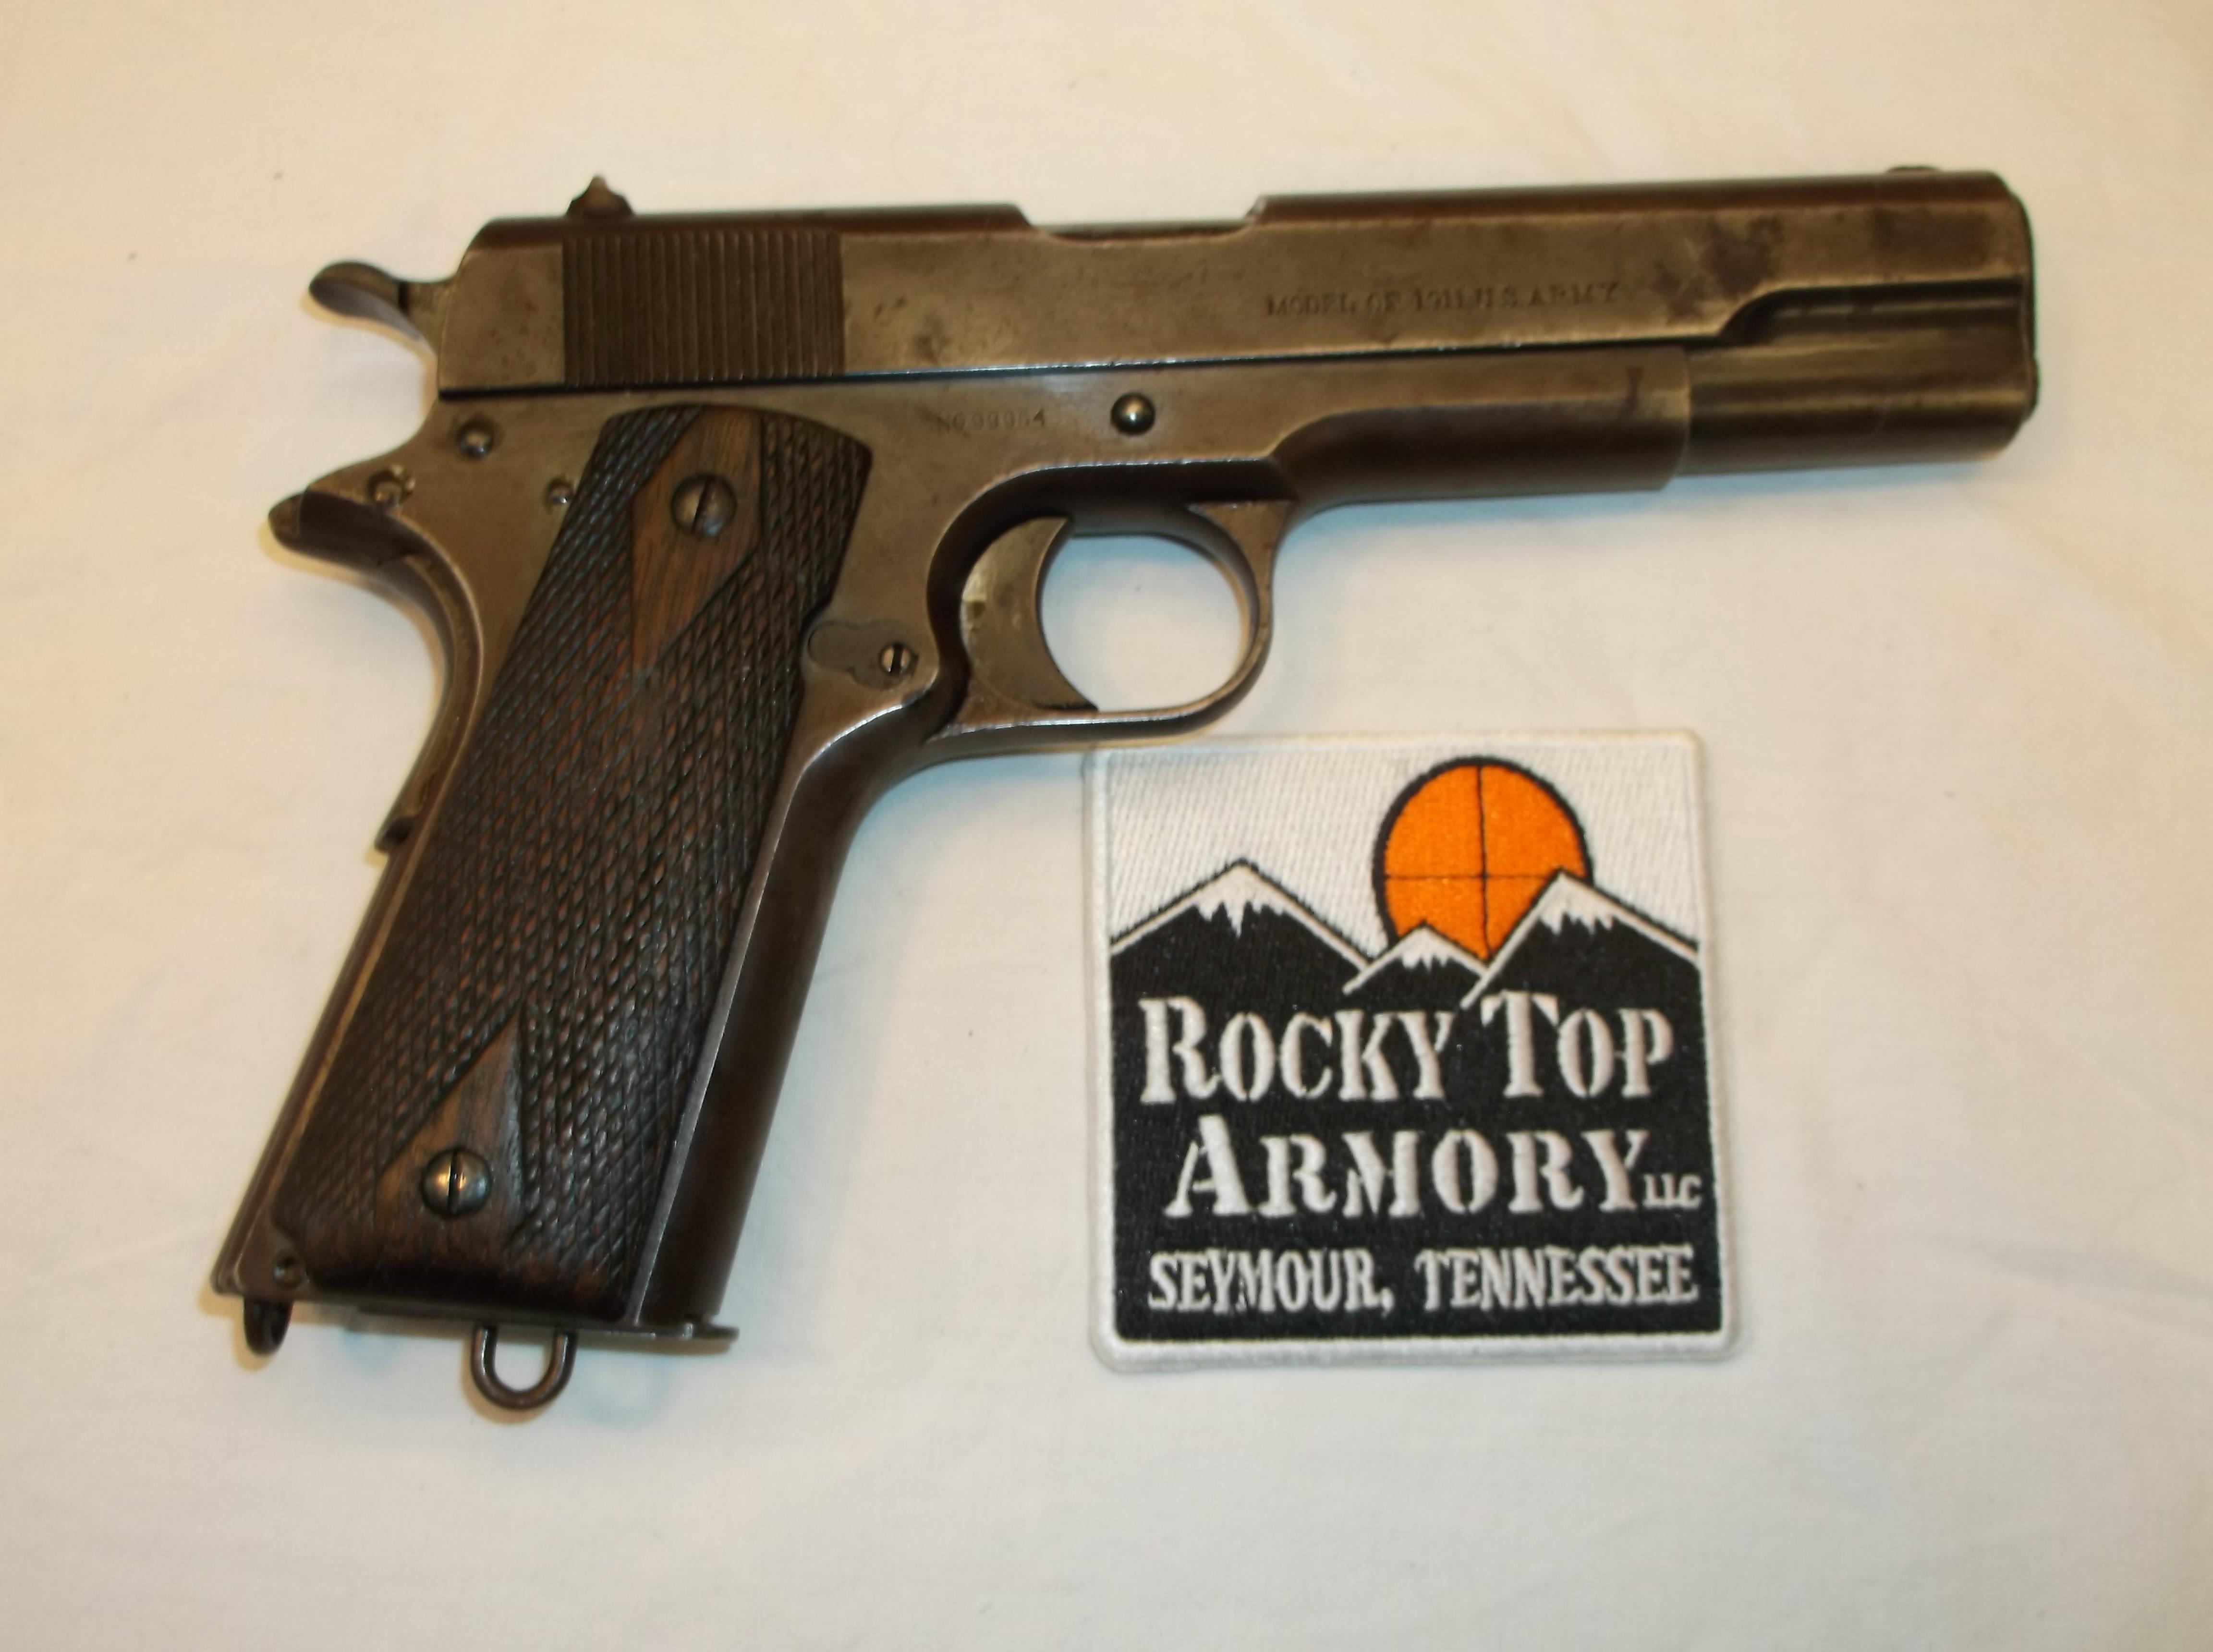 Specials | Rocky Top Armory